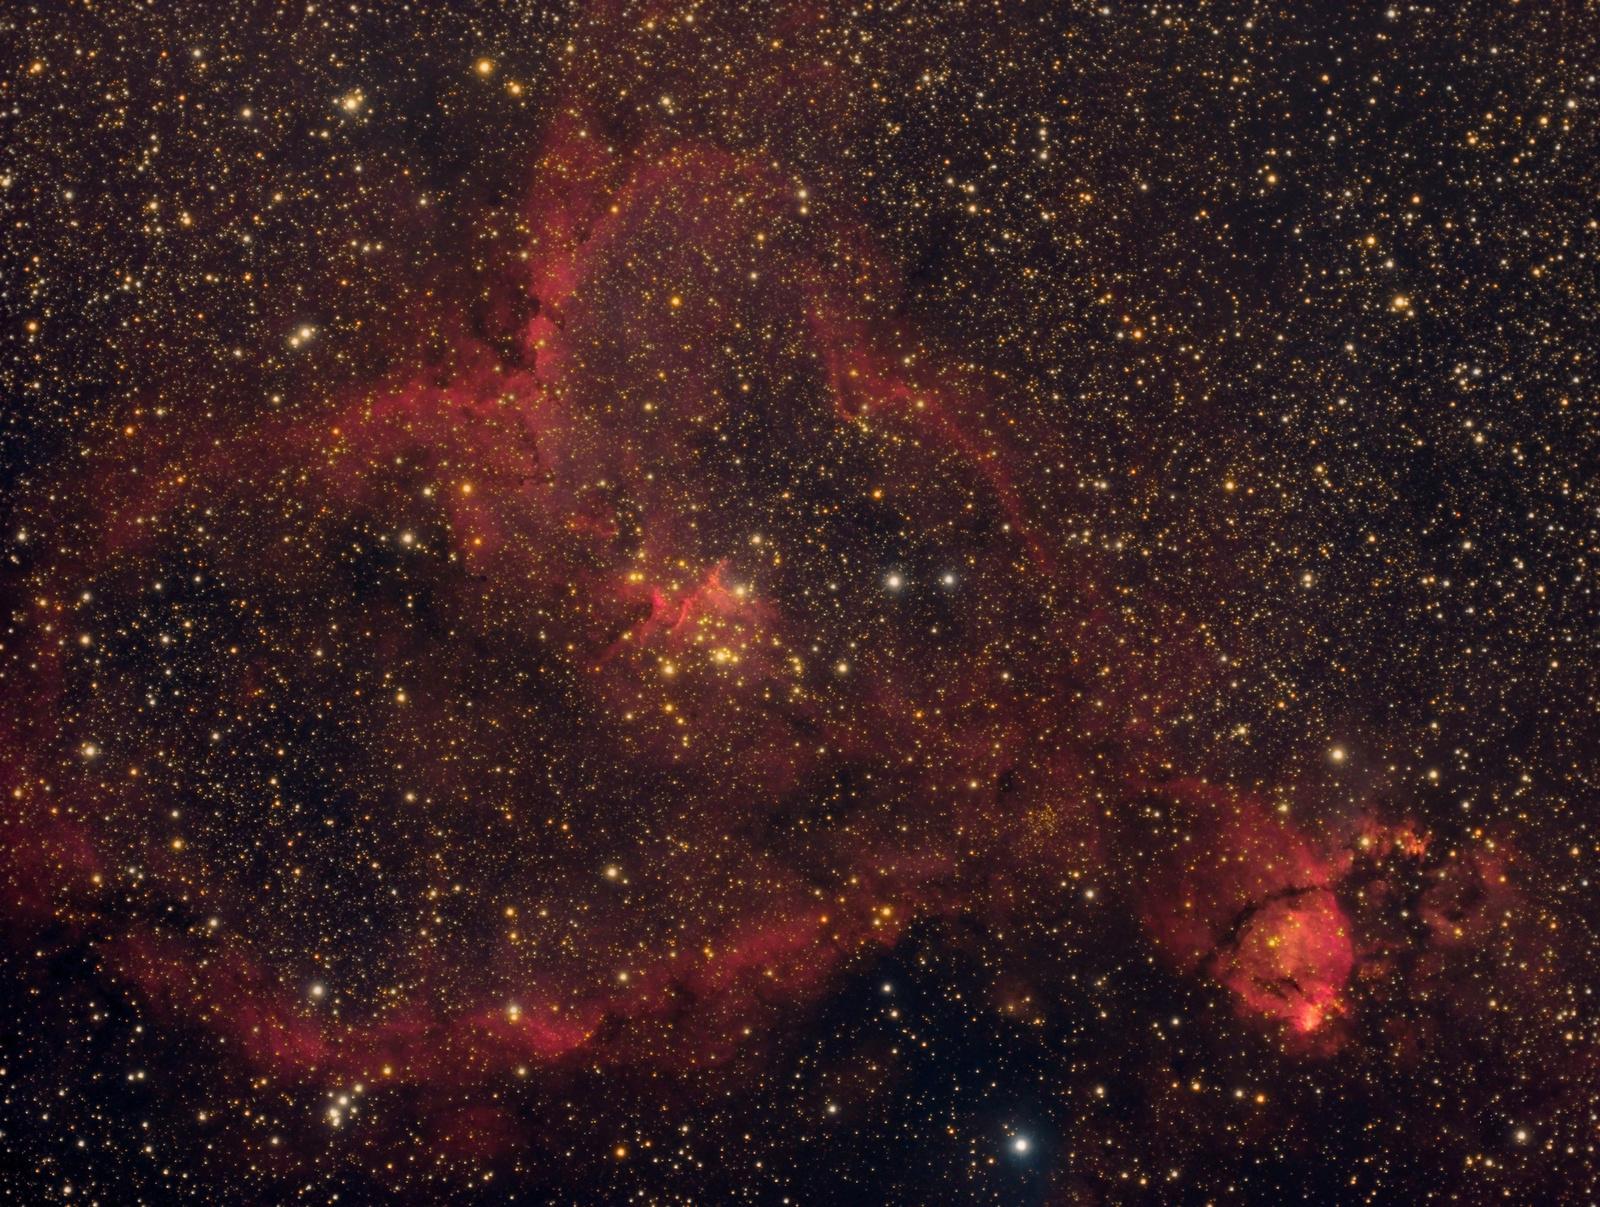 IC1805LRGB_v1.thumb.jpg.8416ebe925e6b087a646155dfd06d745.jpg